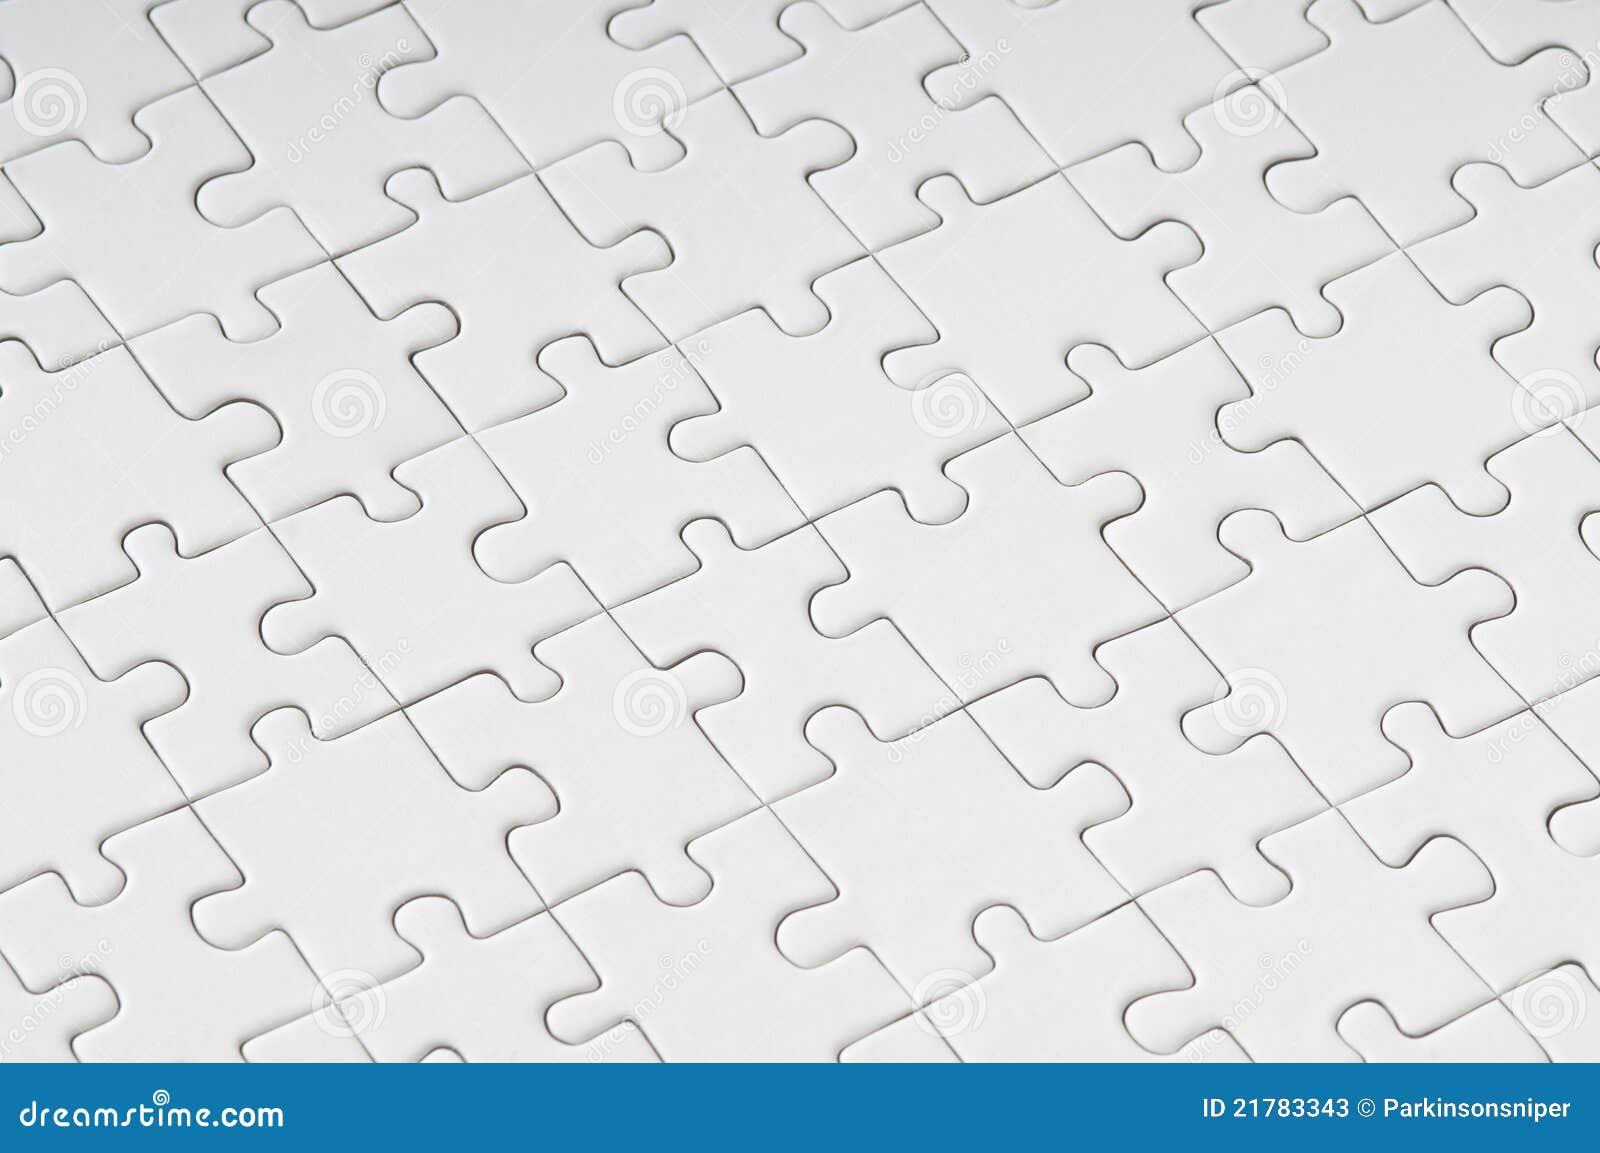 прикройте пустую головоломку